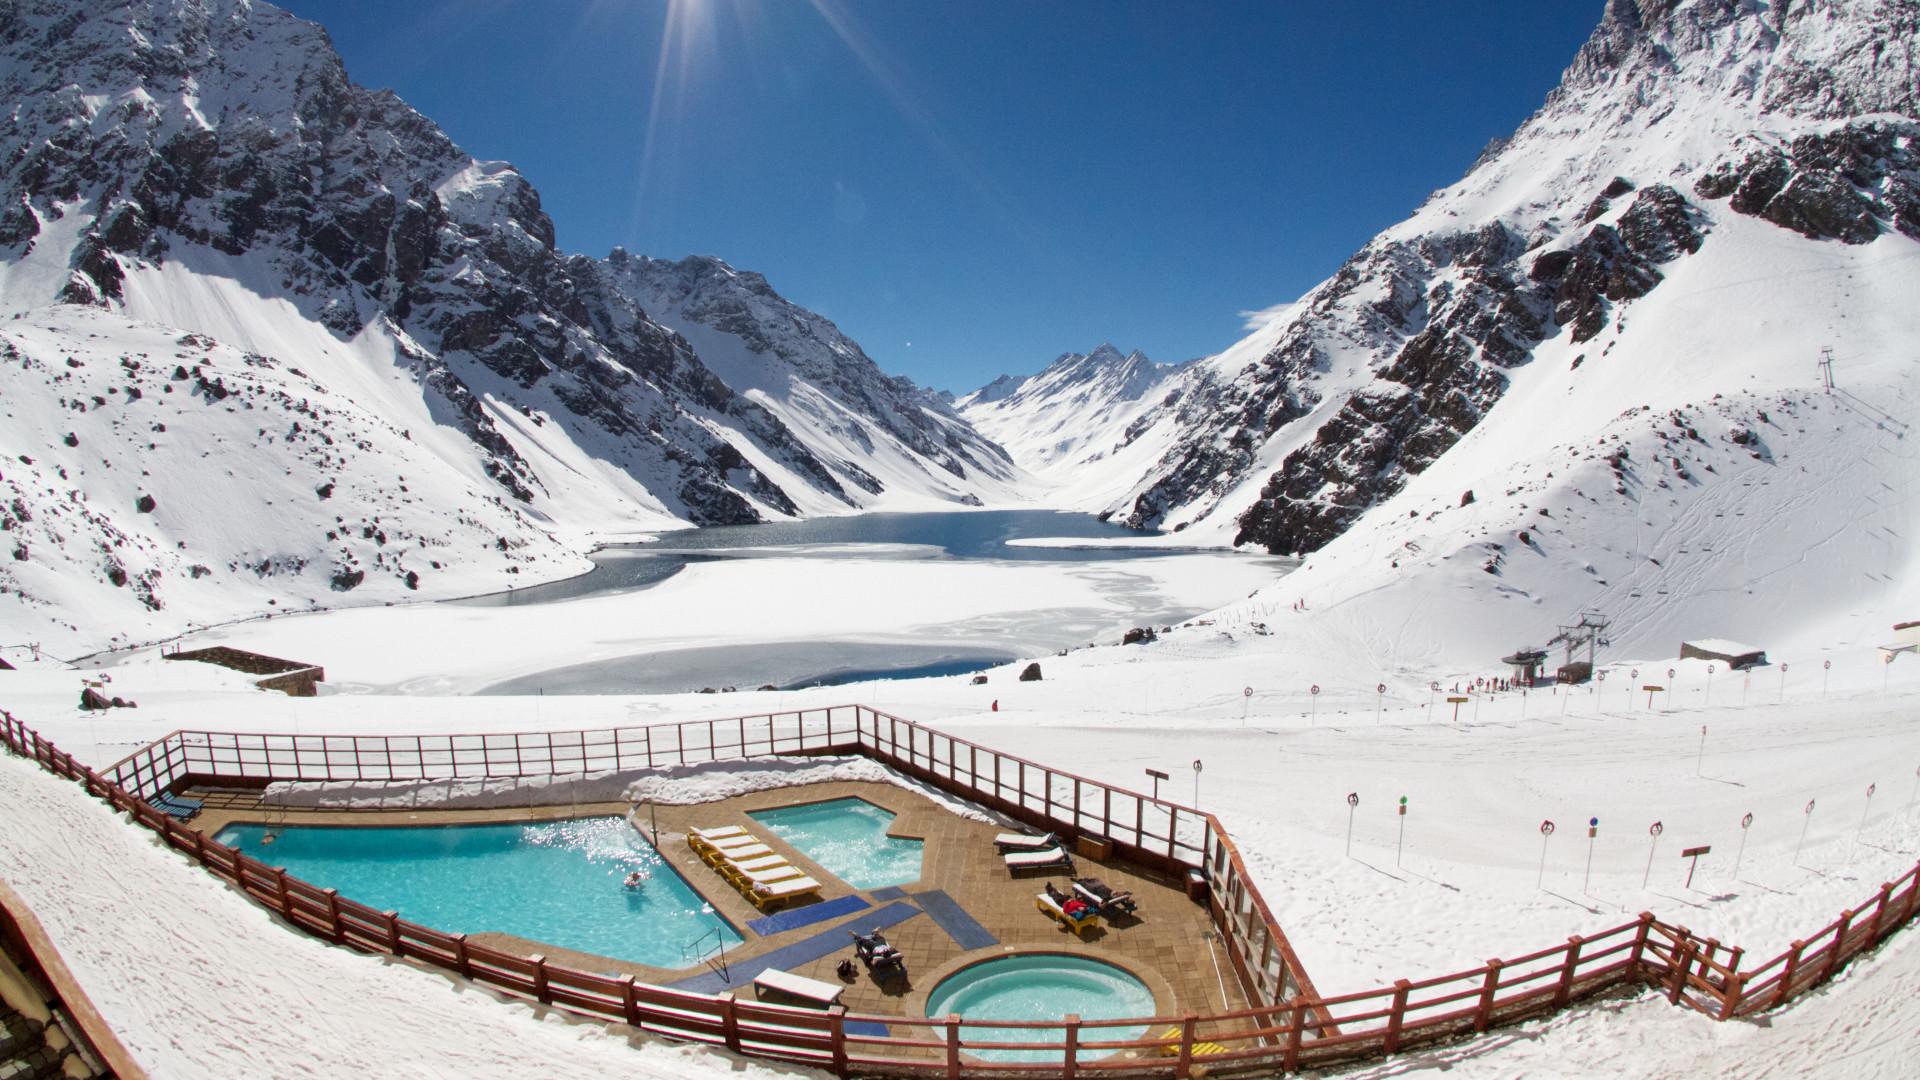 World's Most Awesome Swimming Pools: Ski Portillo Valparaiso